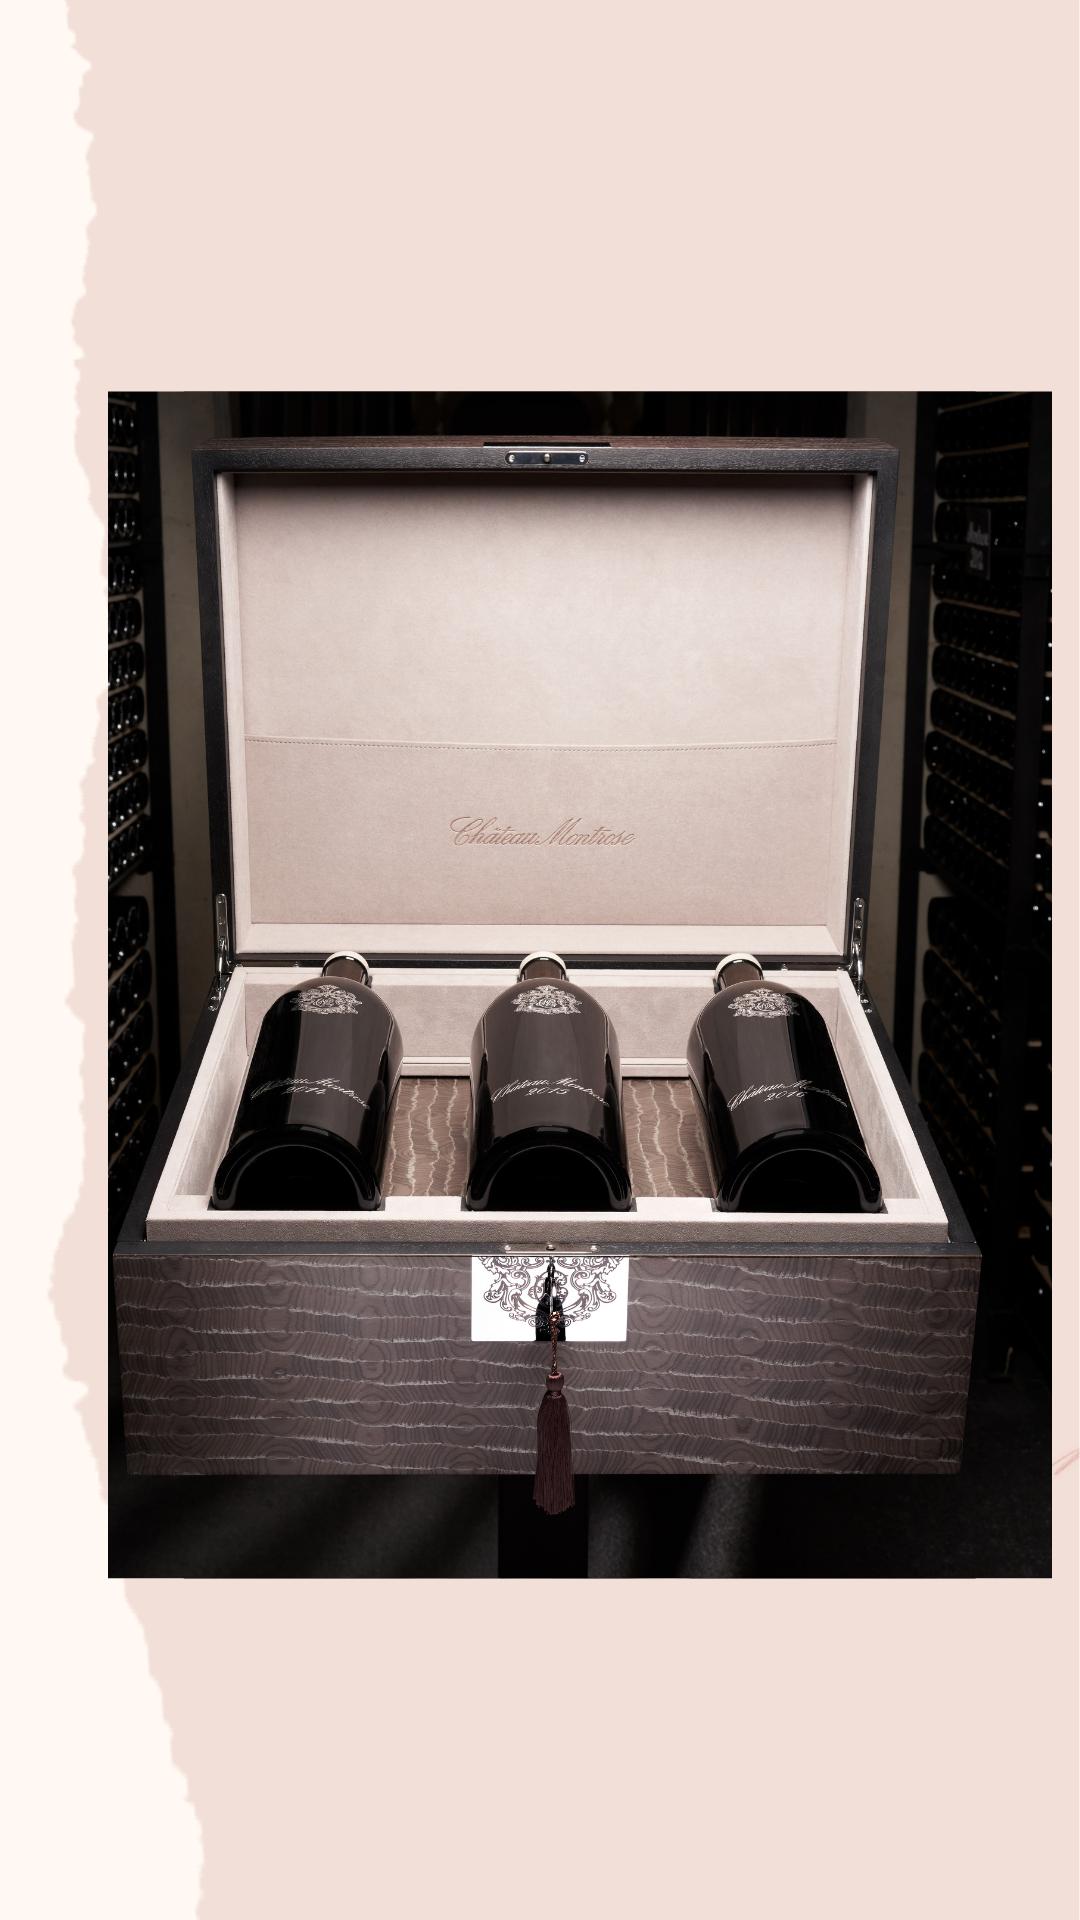 Château Montrose Bicentenary Case Sells at Auction